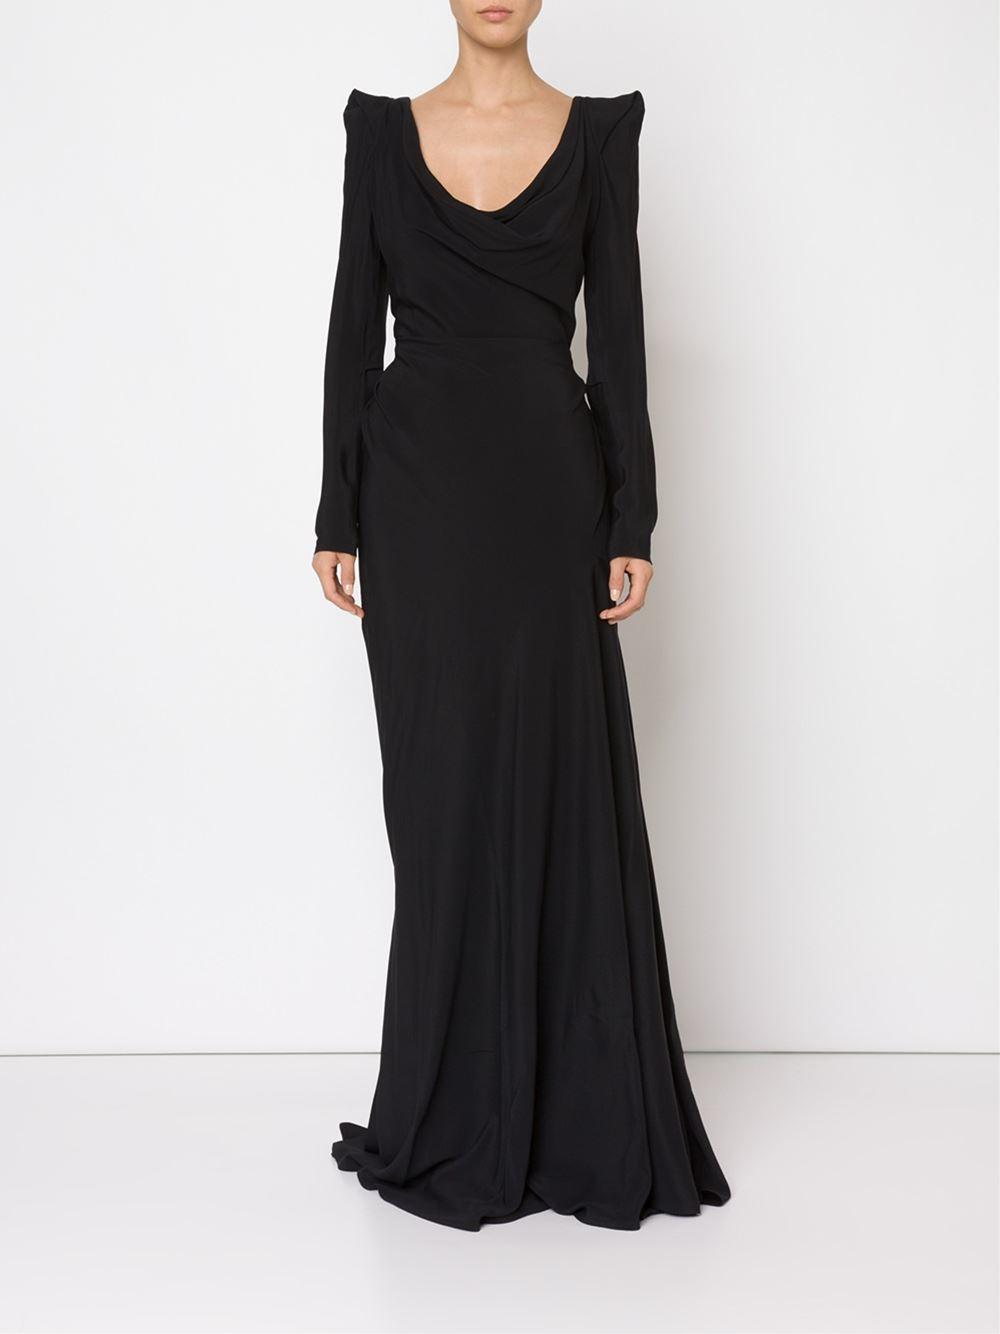 Vivienne Westwood Evening Dresses